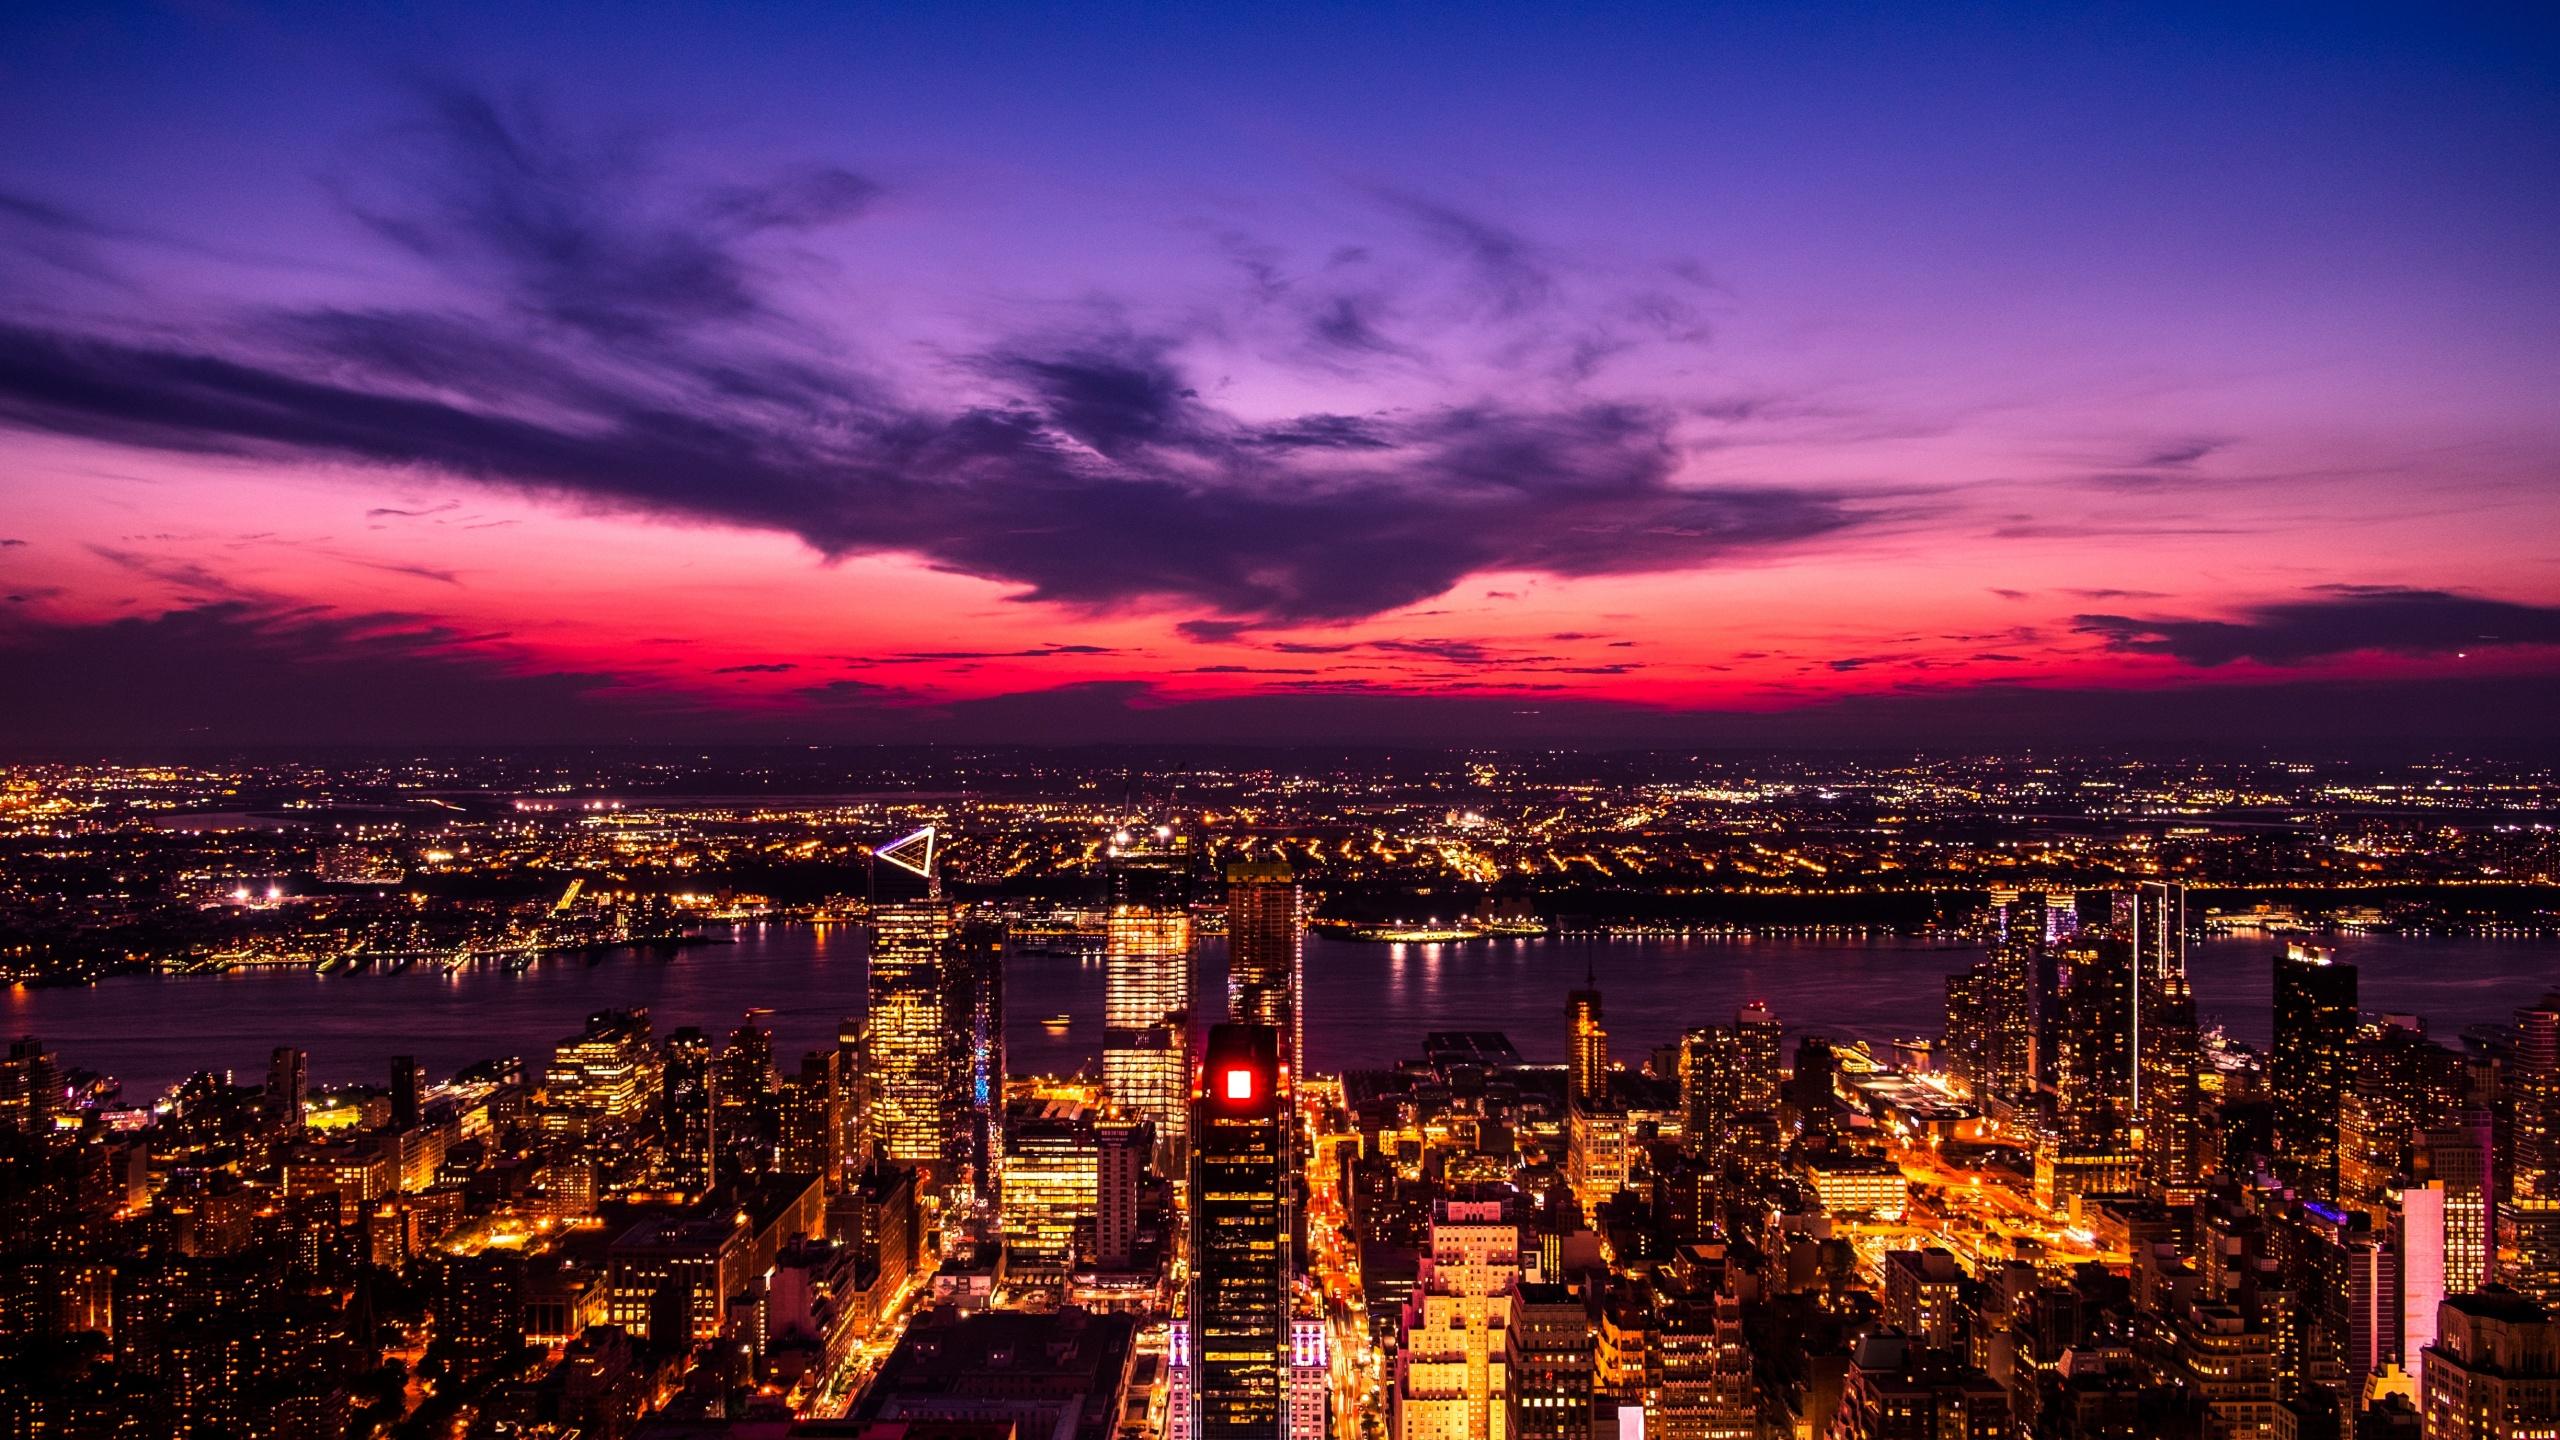 new york city twilight sunset cityscape city lights 5k 2560x1440 1543